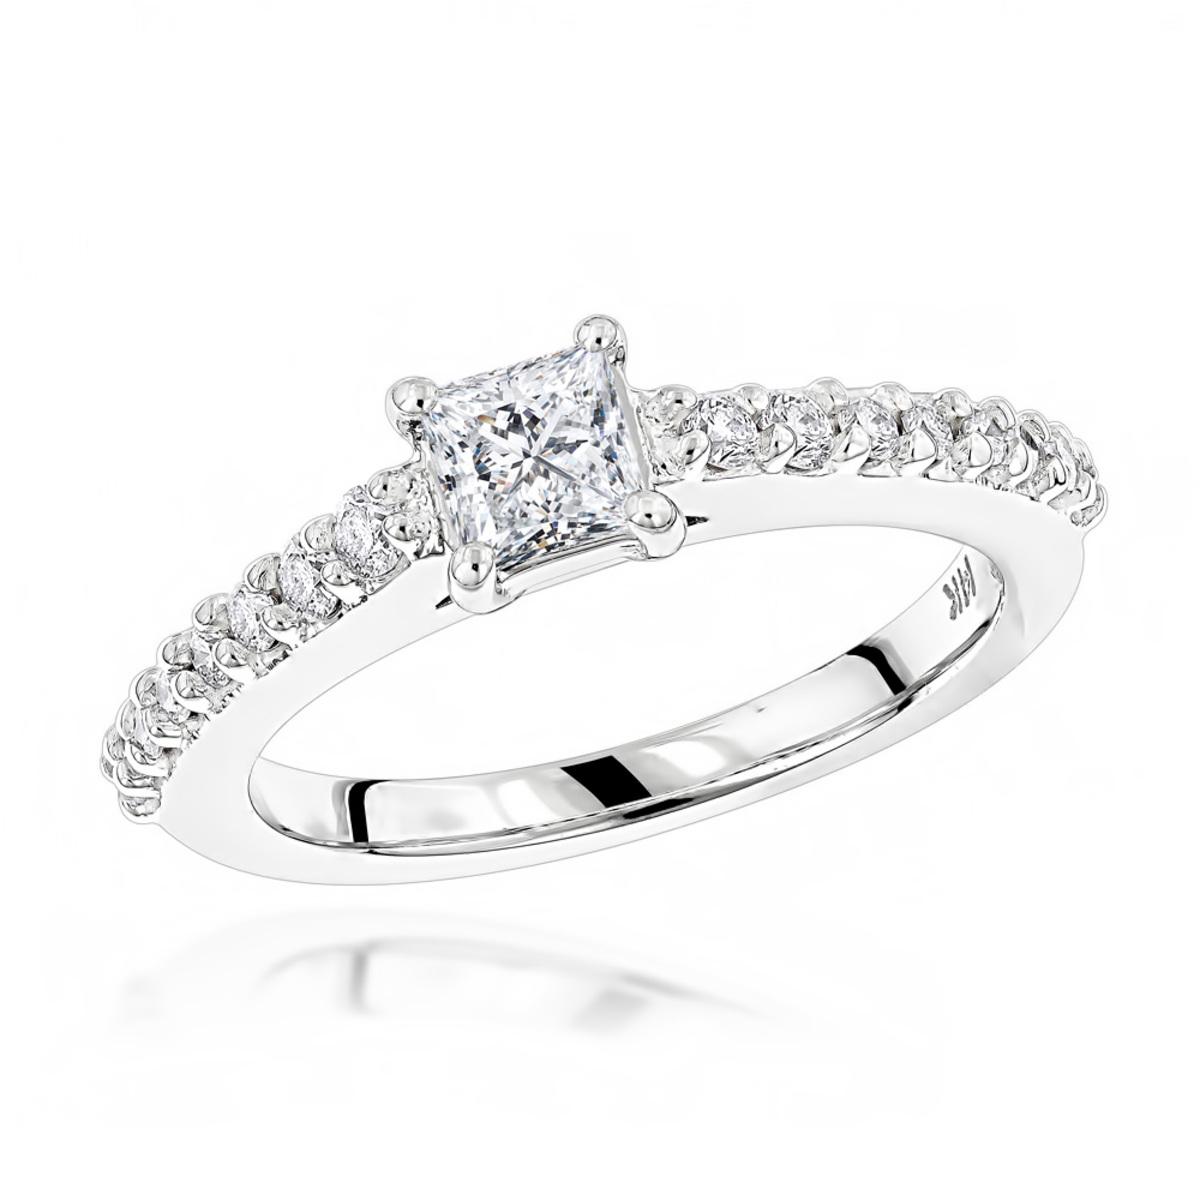 14K Gold Diamond Unique Engagement Ring 0.70ct